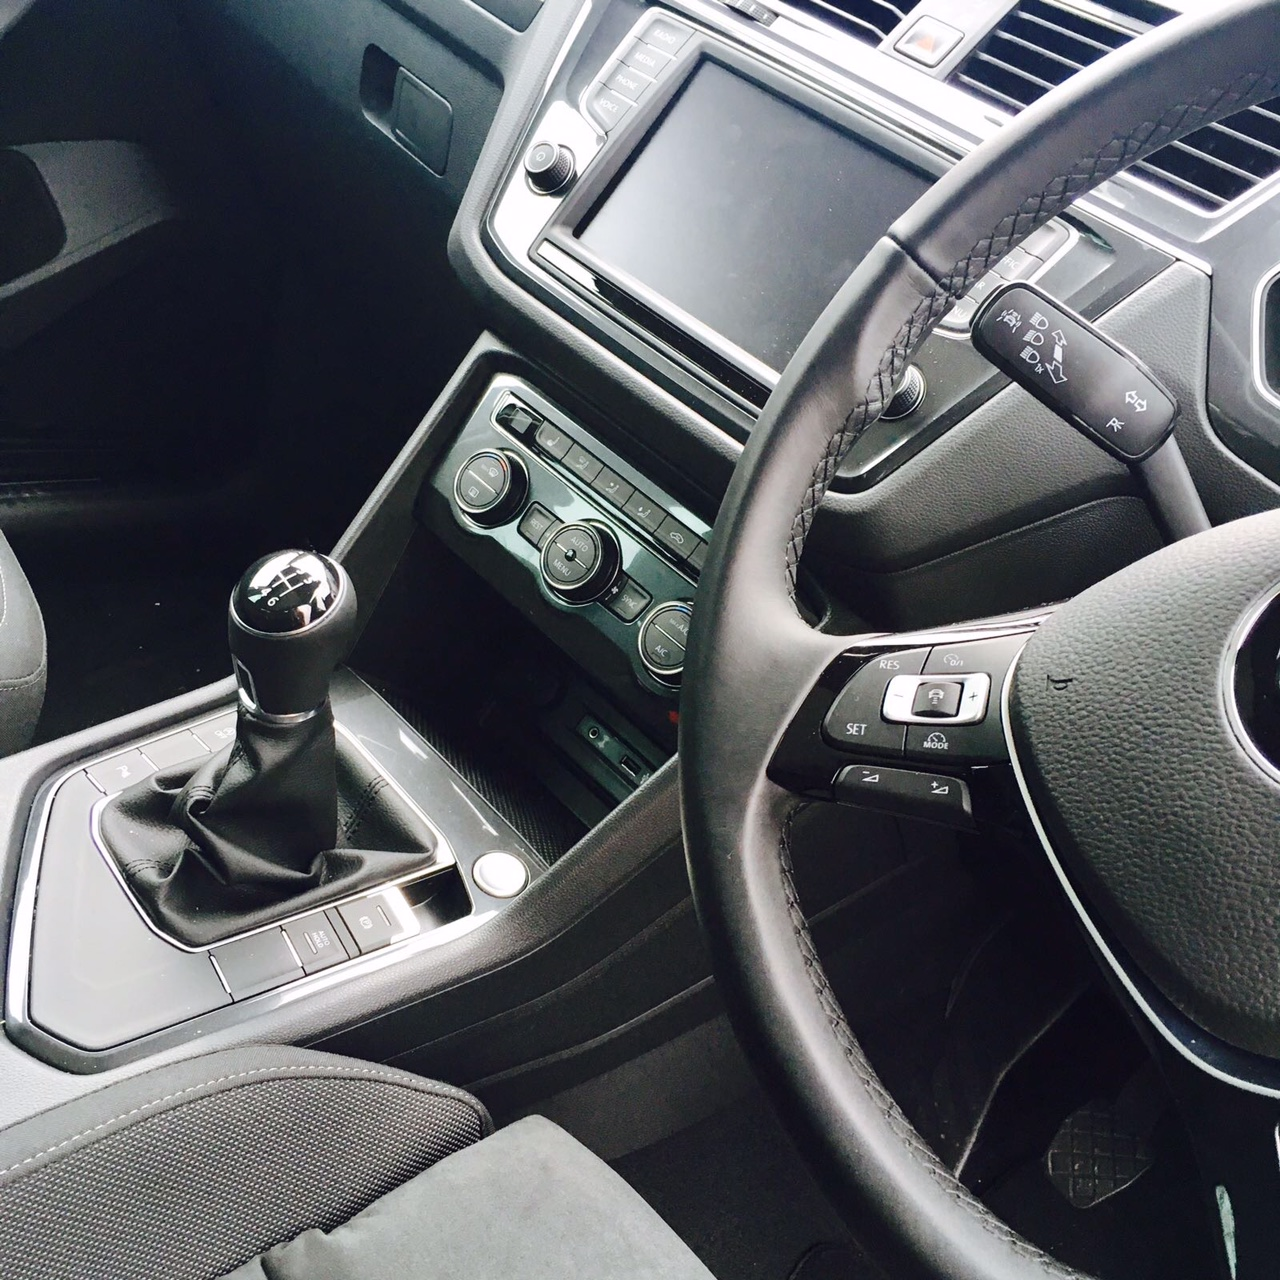 volkswagen-tiguan-diesel-estate-2-0-tdi-bmt-150-sel-5dr-manual-car-leasing-luxury